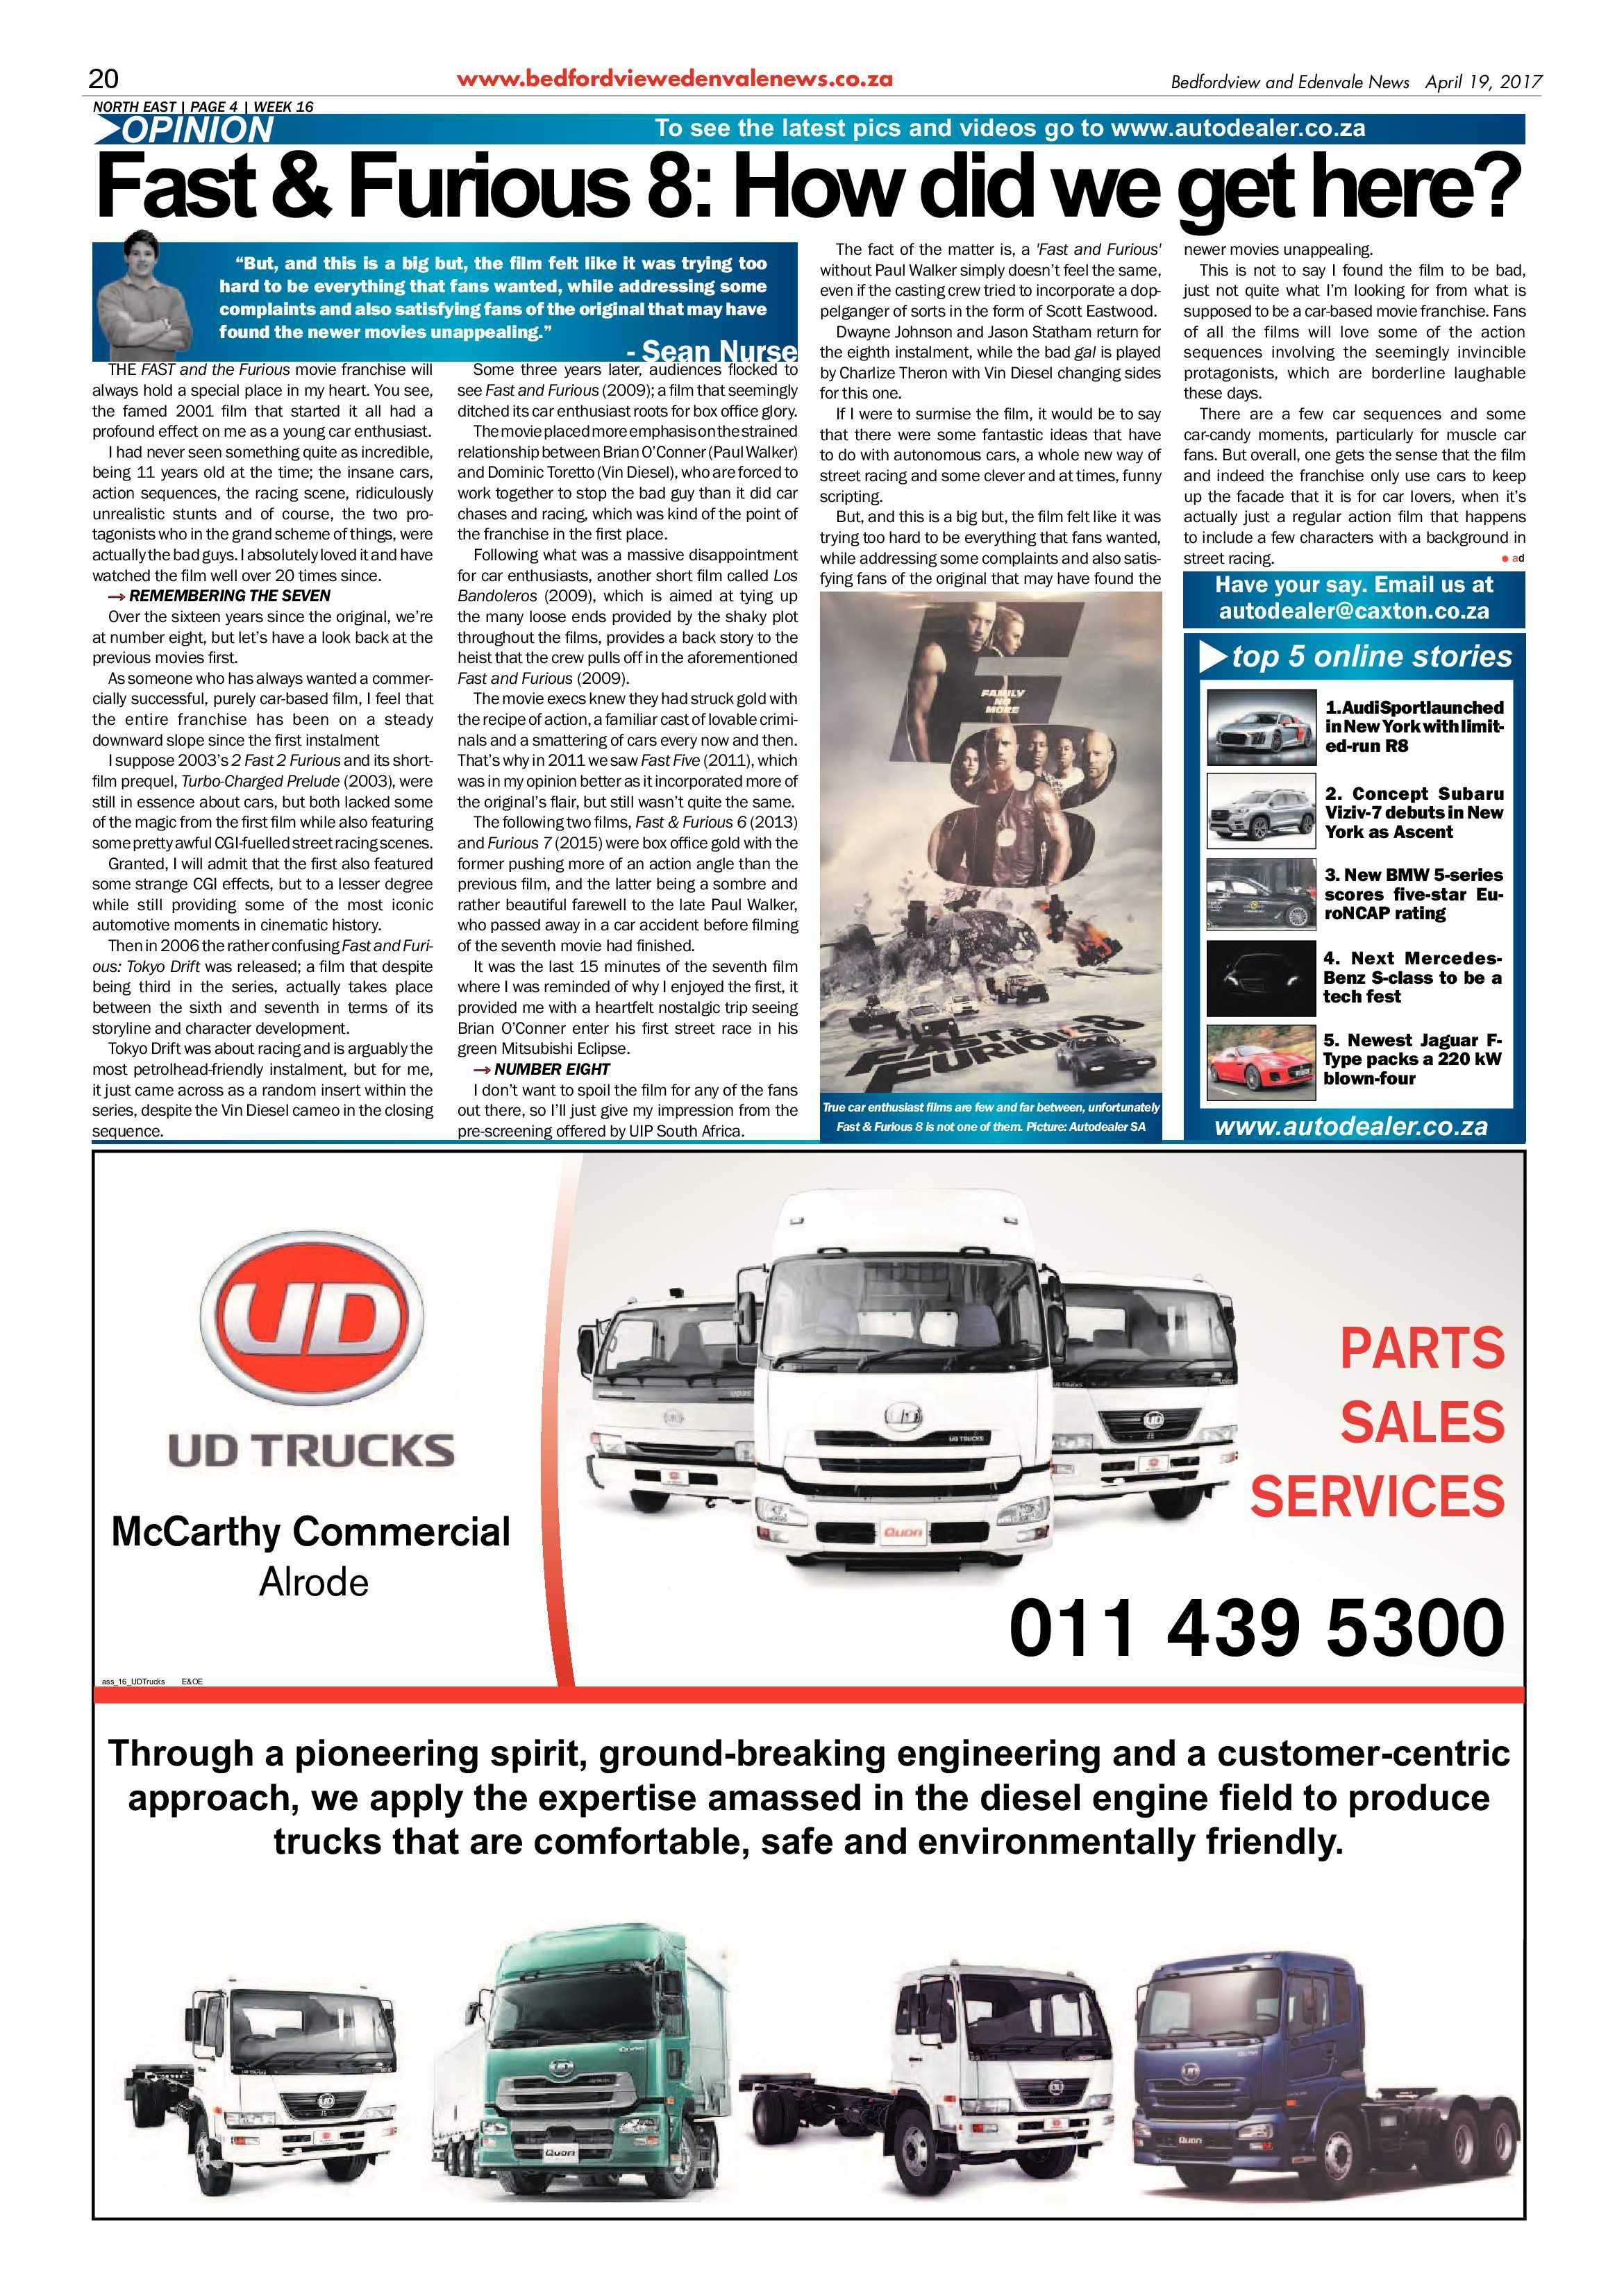 bedfordview-edenvale-news-19-april-2017-epapers-page-20